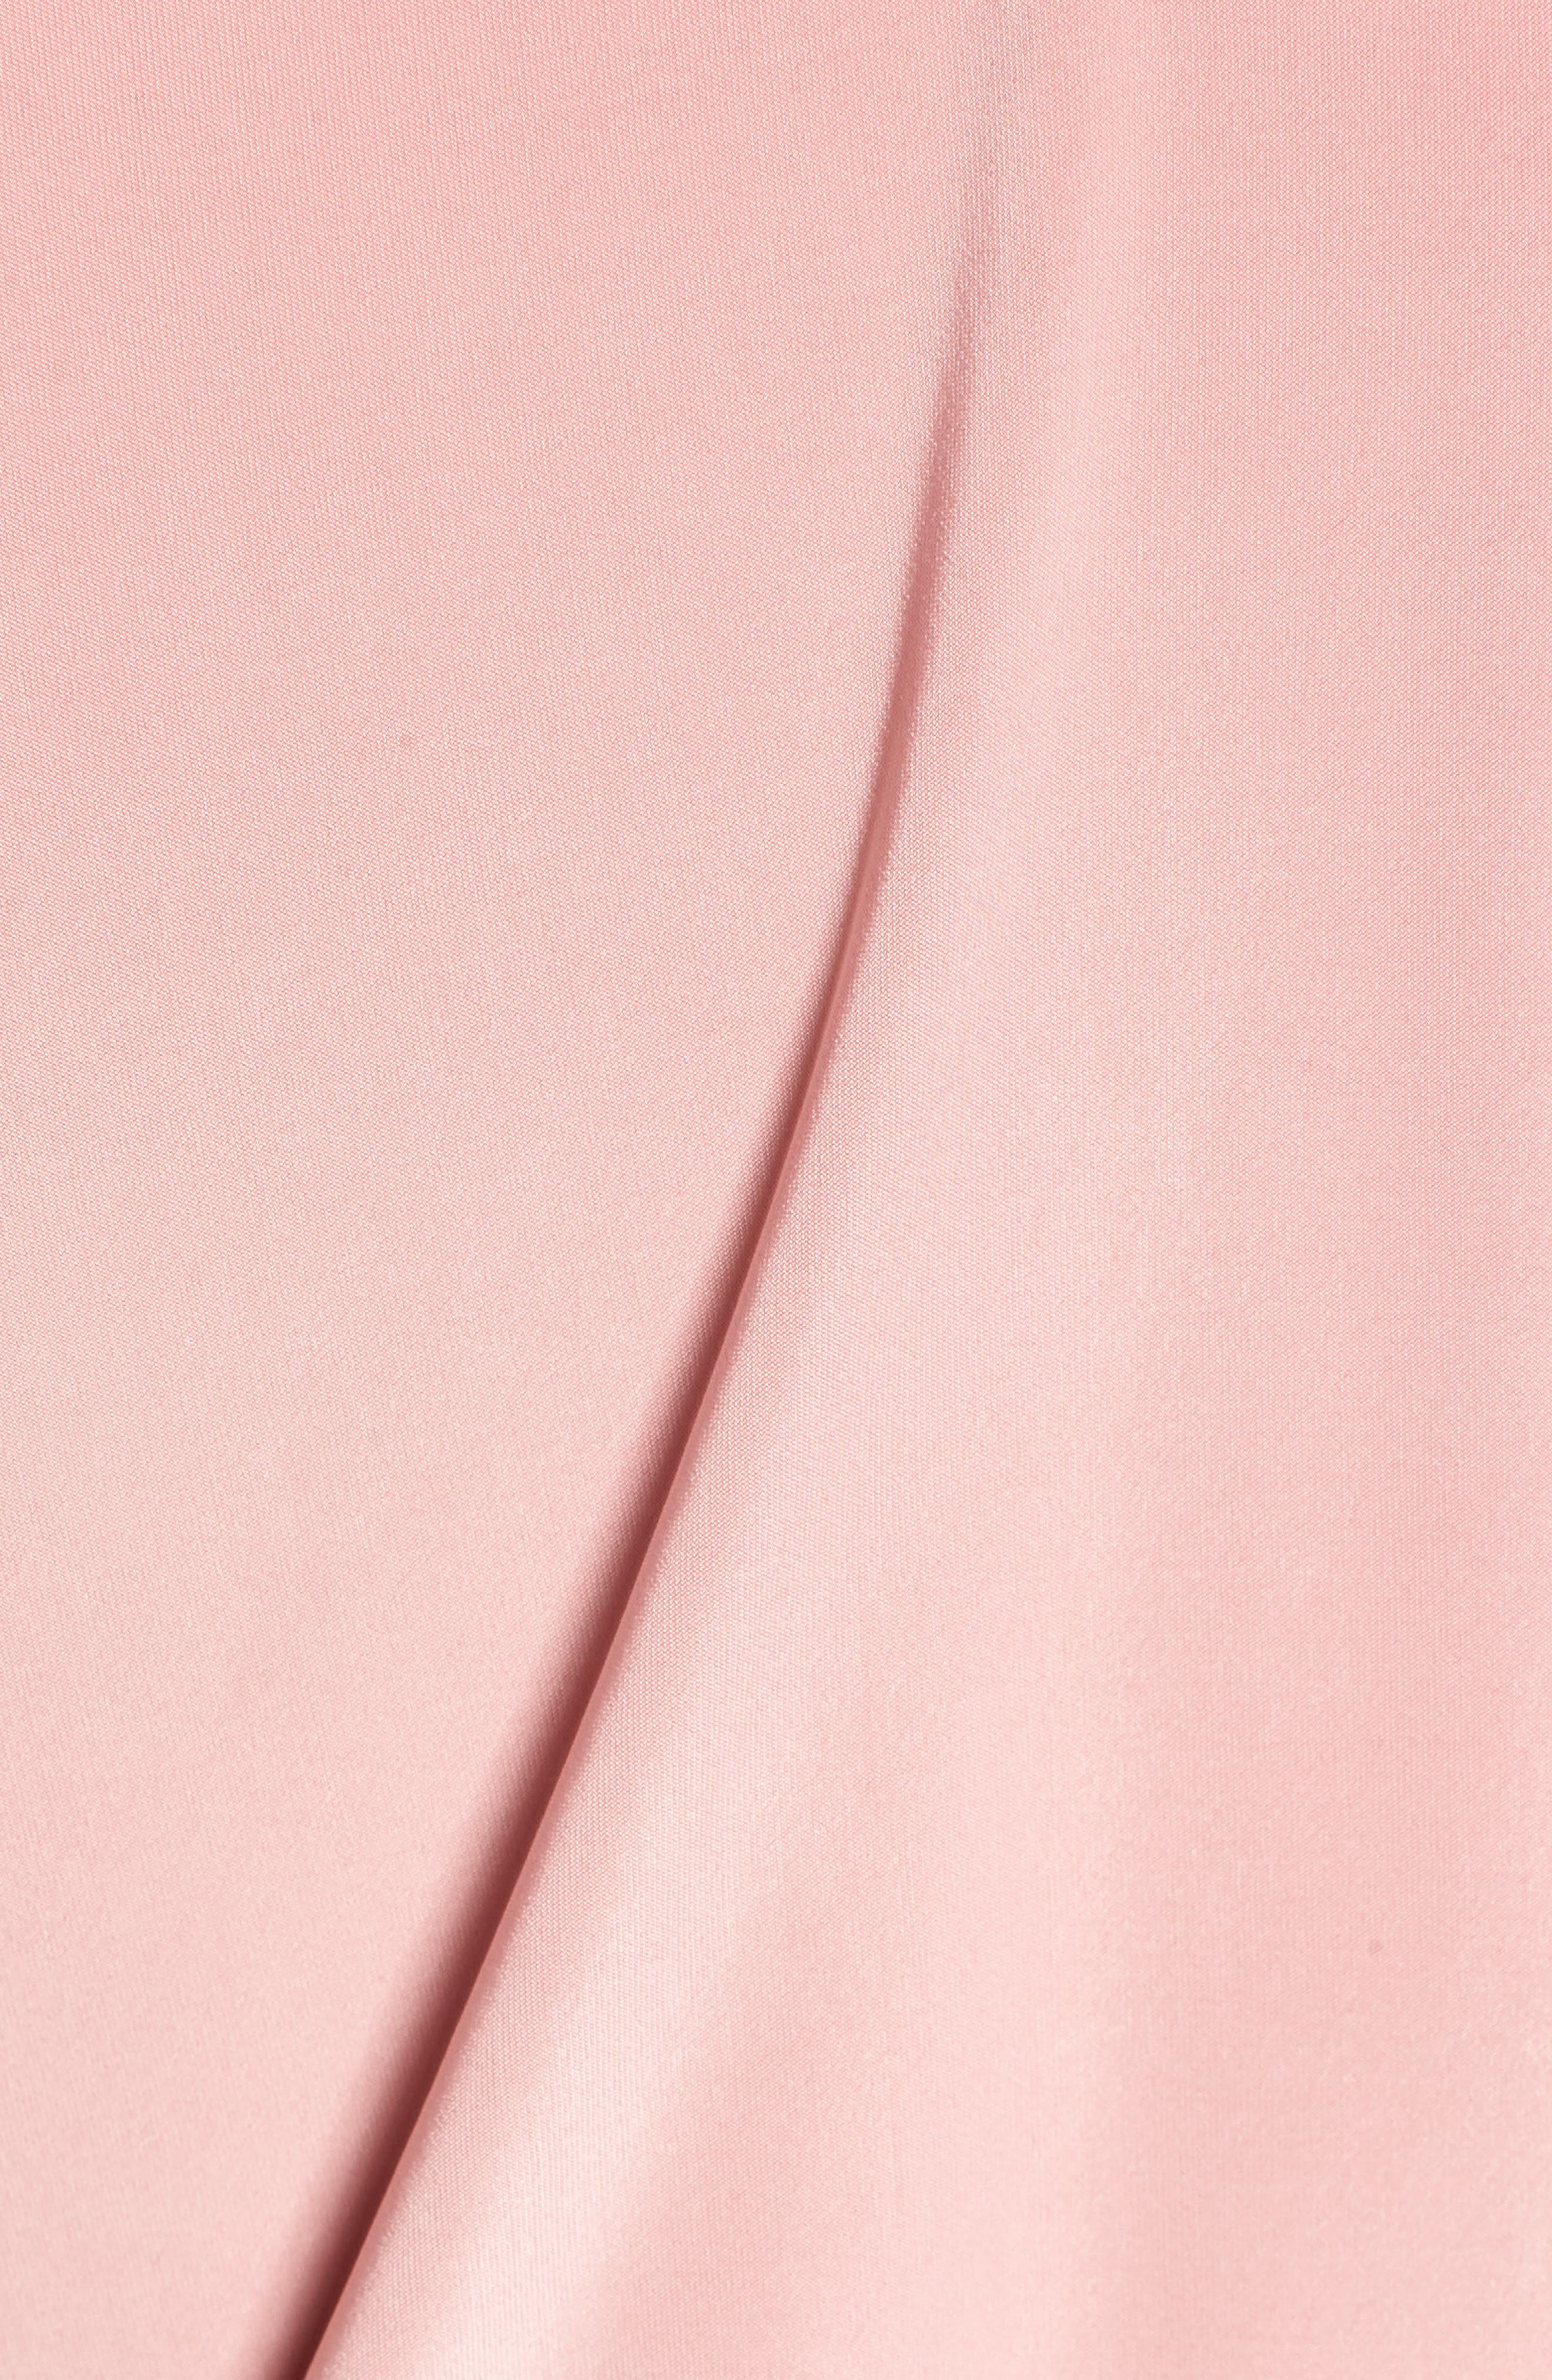 Teget Knot Front Dress,                             Alternate thumbnail 6, color,                             DUSTY ROSE